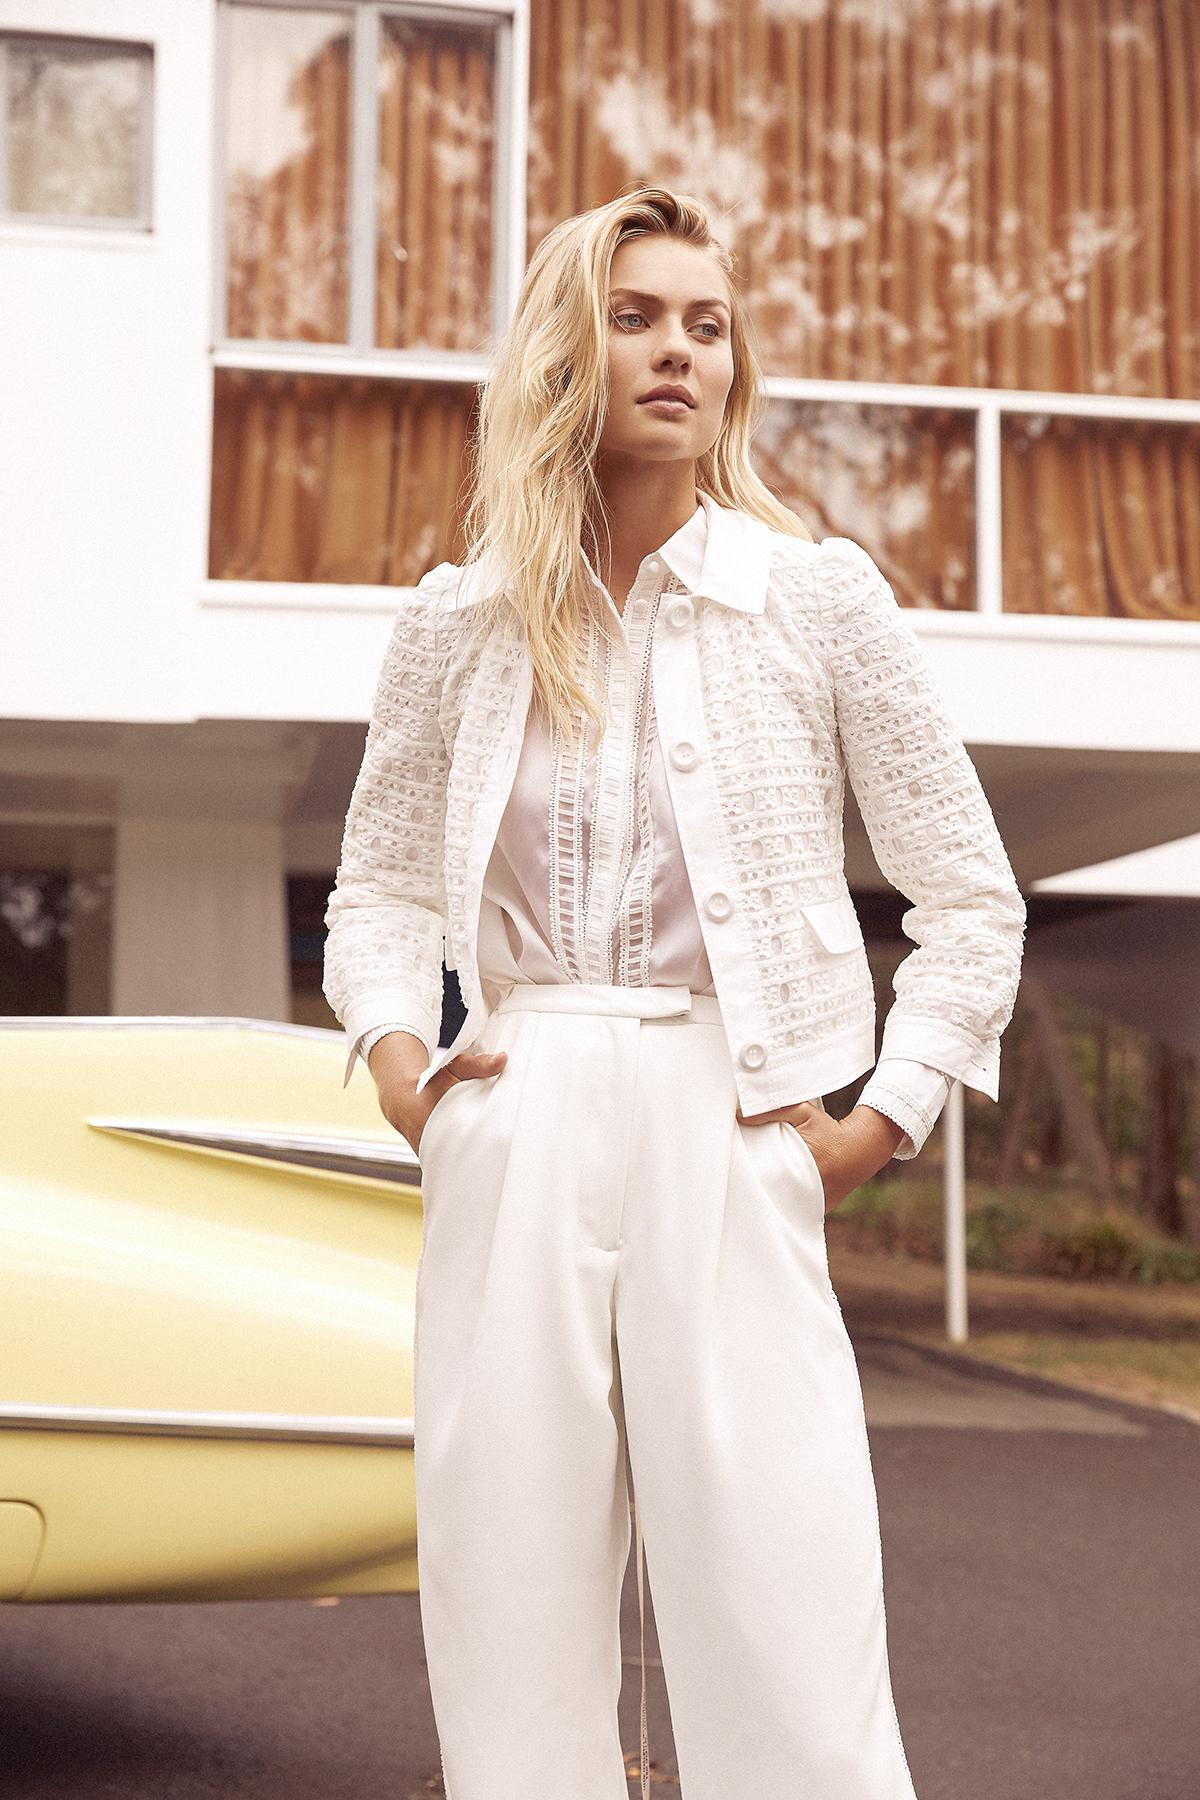 Elyse Knowles STM Perth September 16th 2018 0.jpg